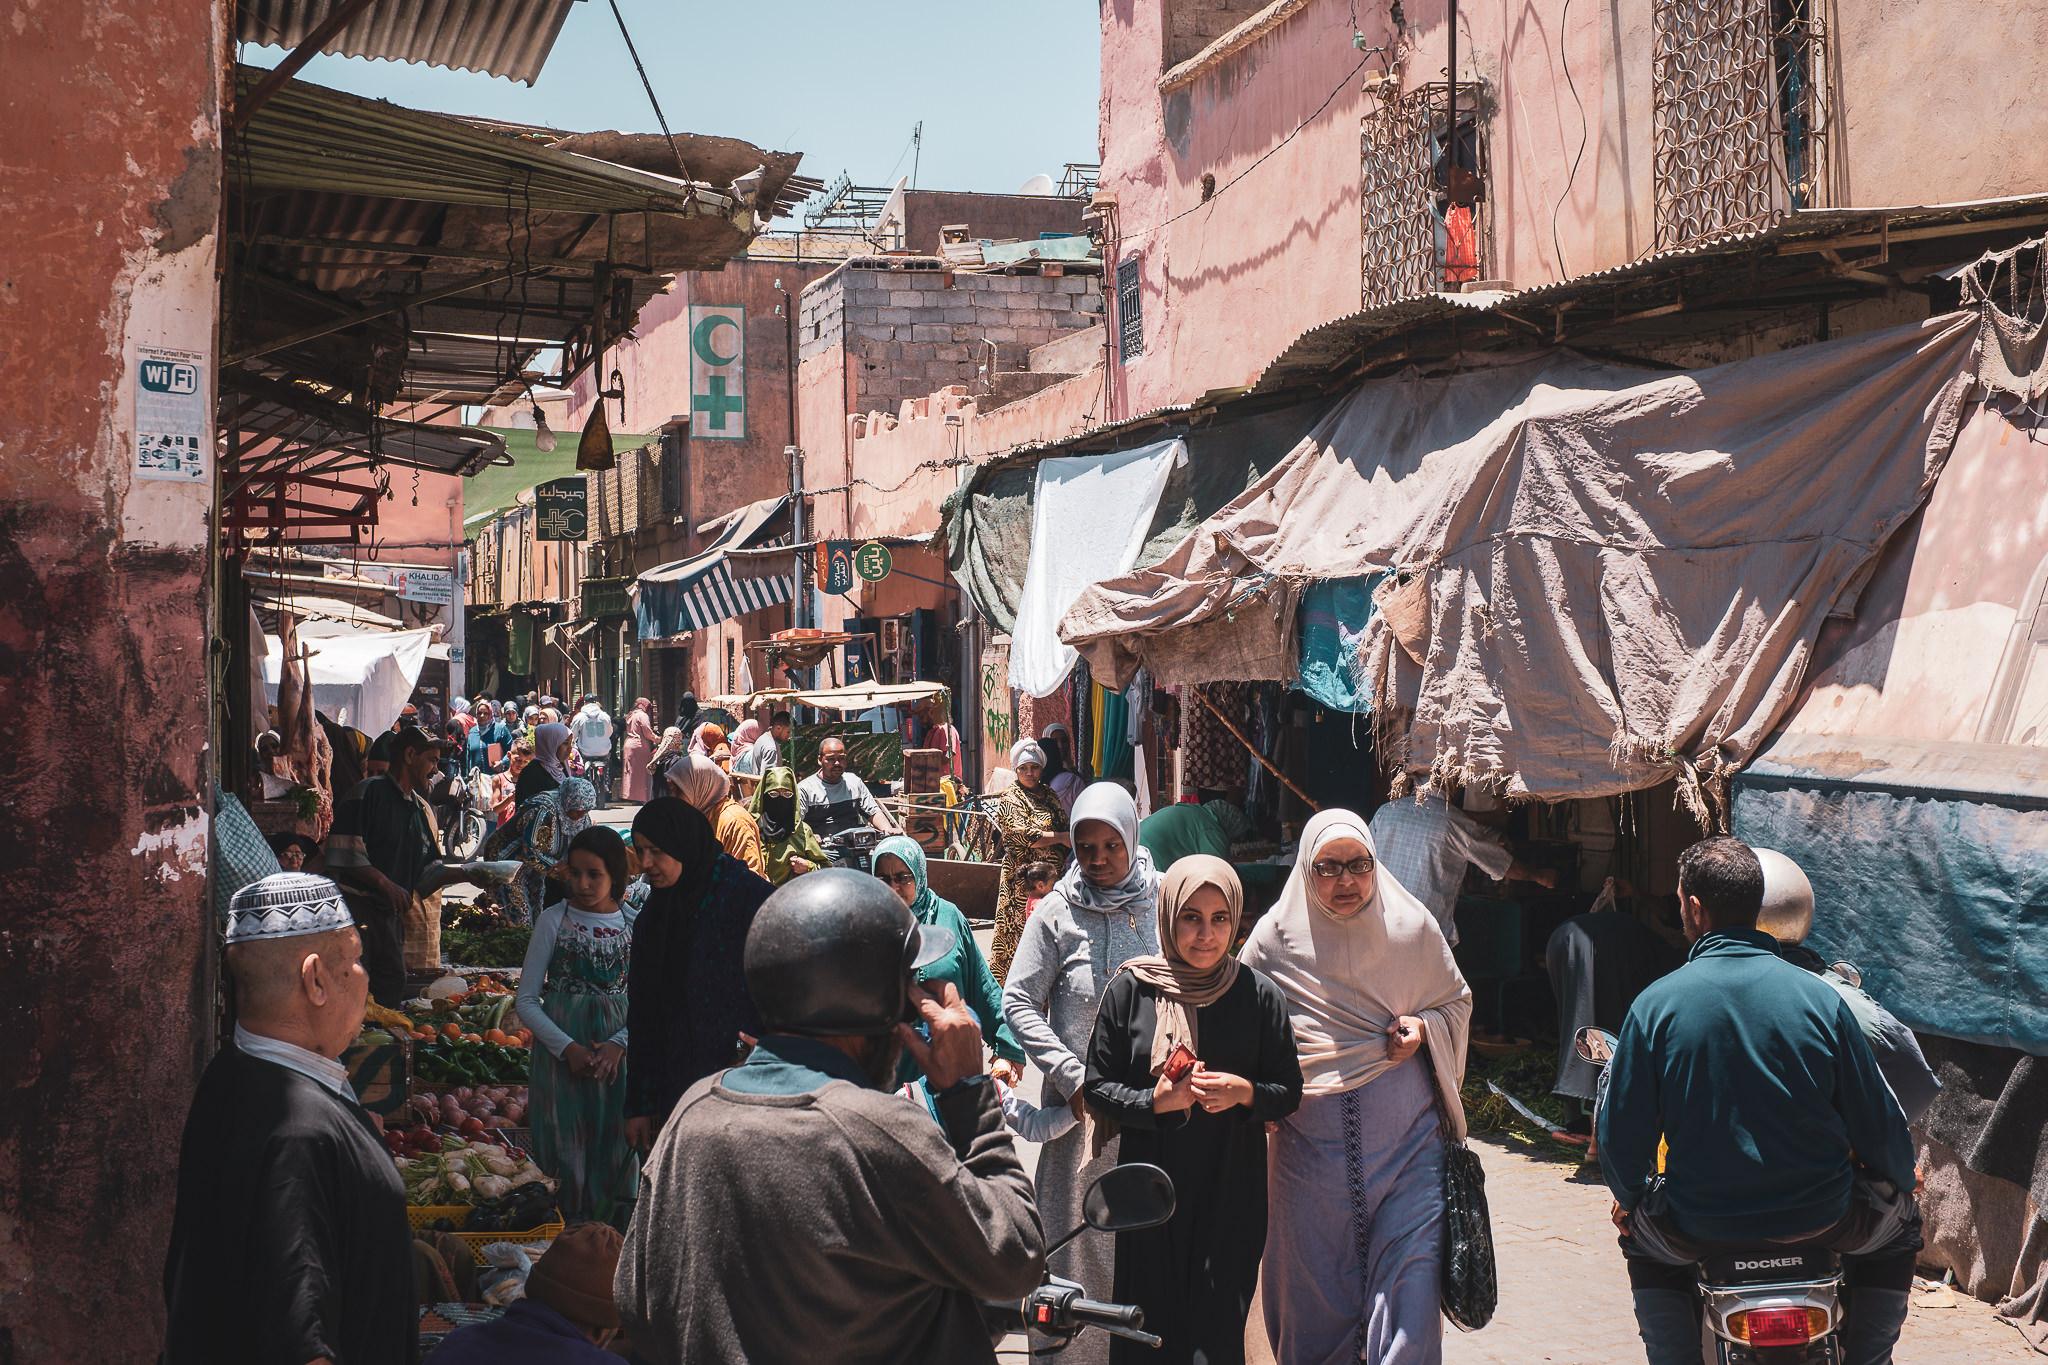 Marrakesh Street Photography.jpg